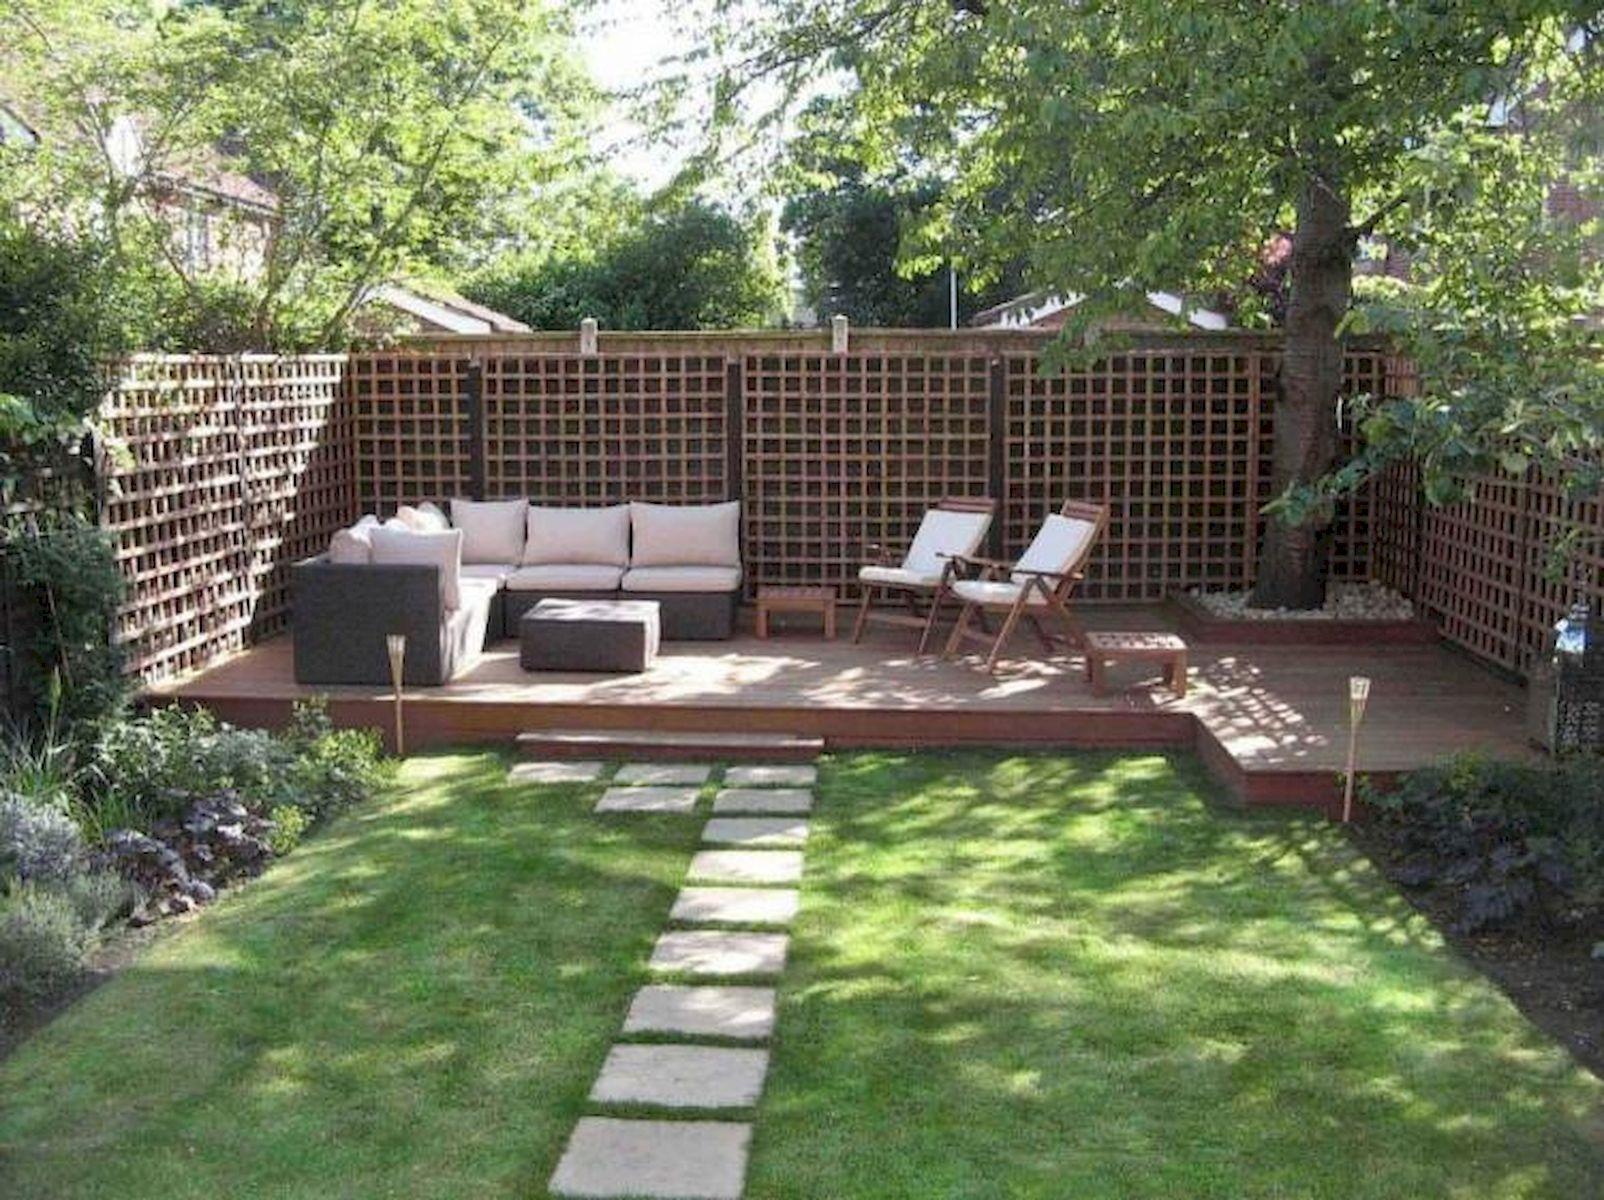 60 Awesome DIY Backyard Privacy Design And Decor Ideas (57)